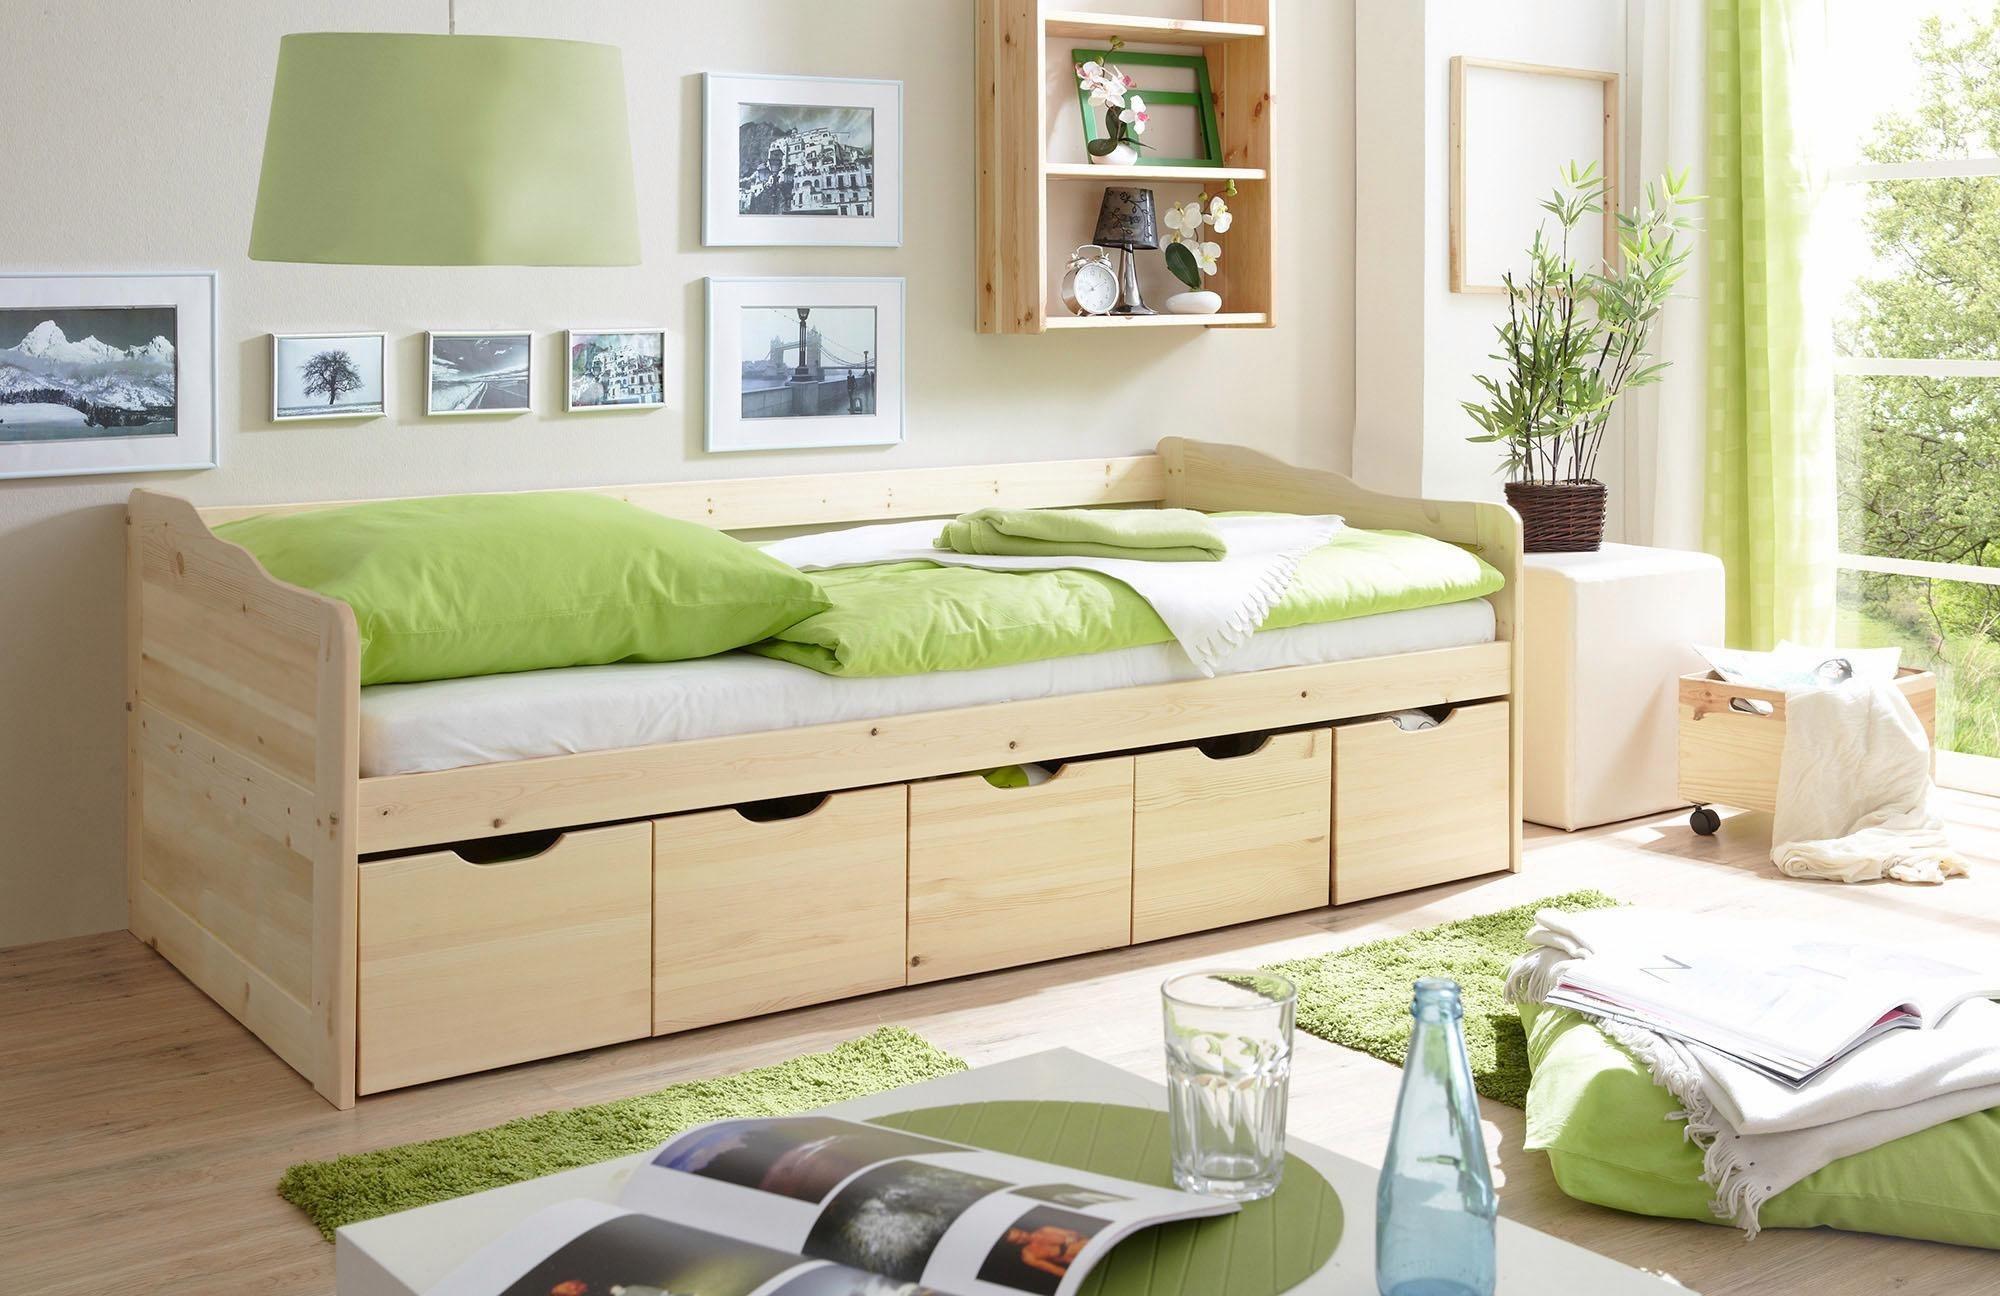 Ticaa Funktionsbett »Maria« mit 5 Schubkästen, Kiefer | Schlafzimmer > Betten > Funktionsbetten | Massiver - Kiefer | Ticaa